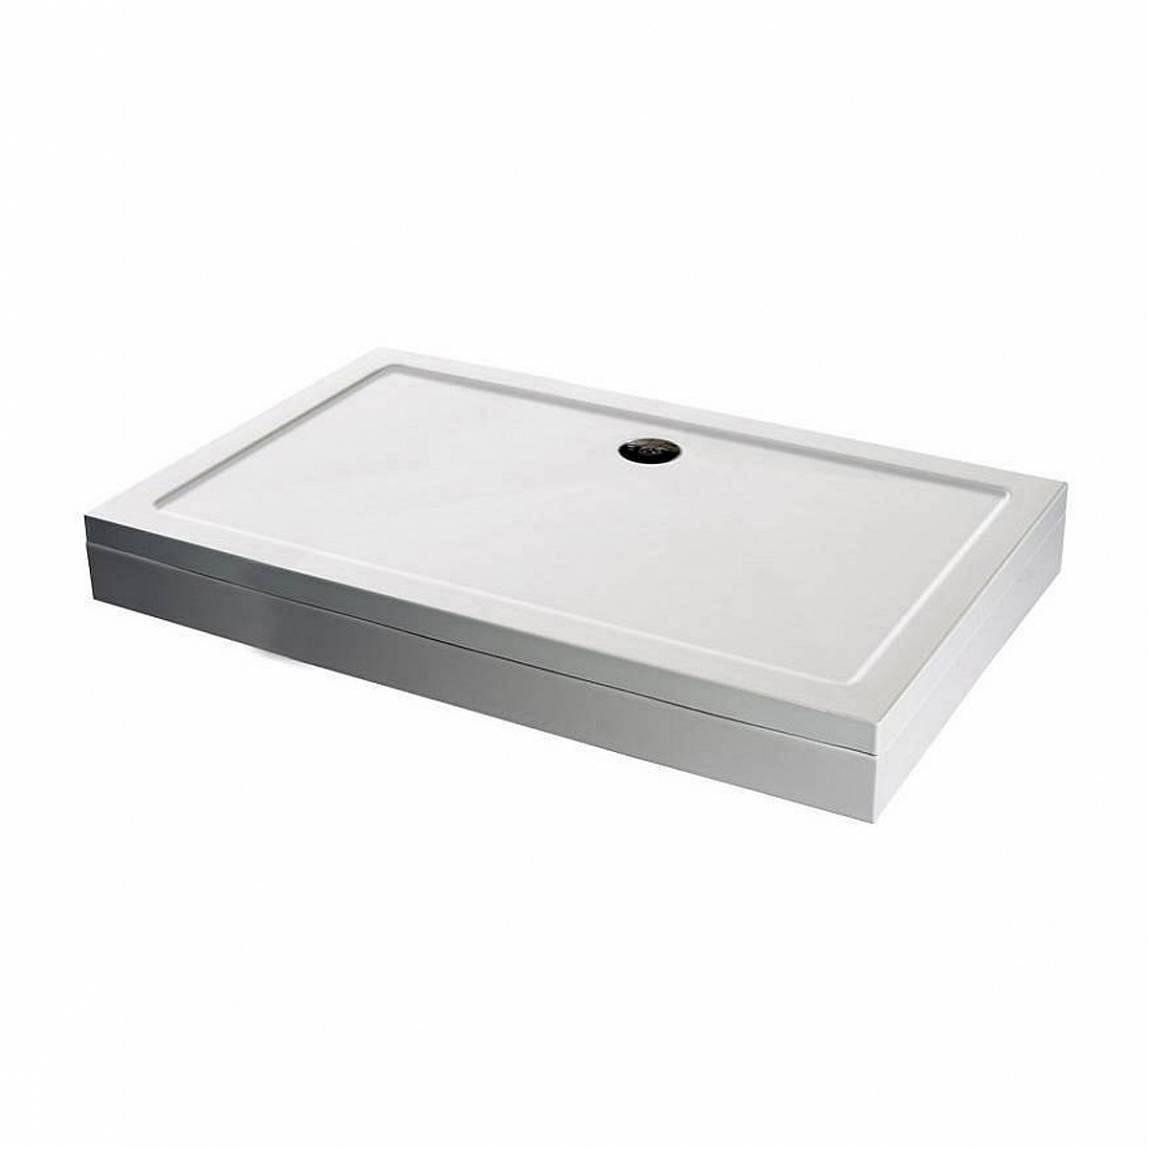 Image of Rectangular Stone Shower Tray & Riser Kit 1000 x 760